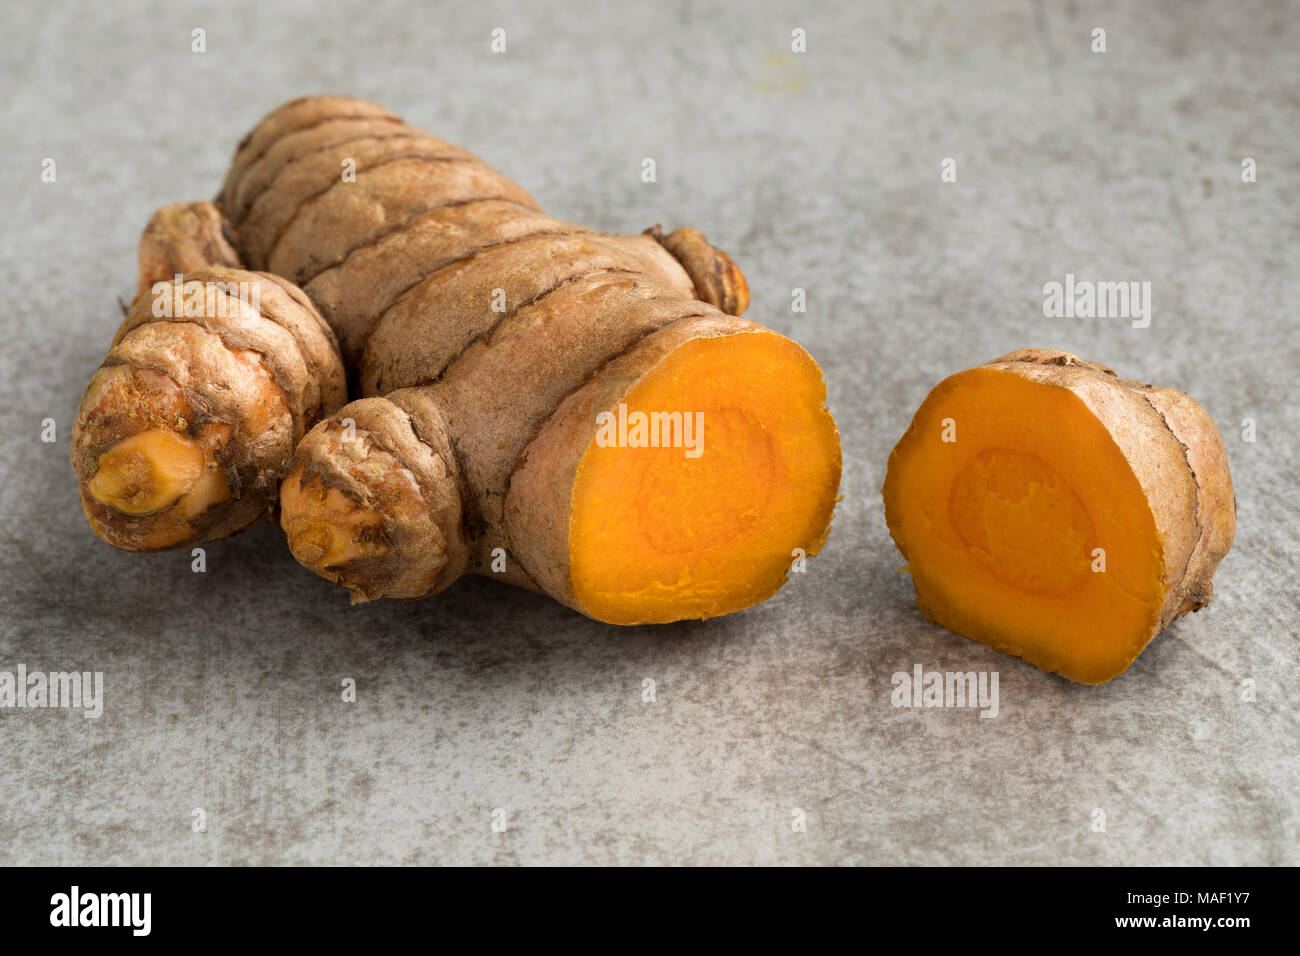 Fresh sliced yellow turmeric rhizome - Stock Image